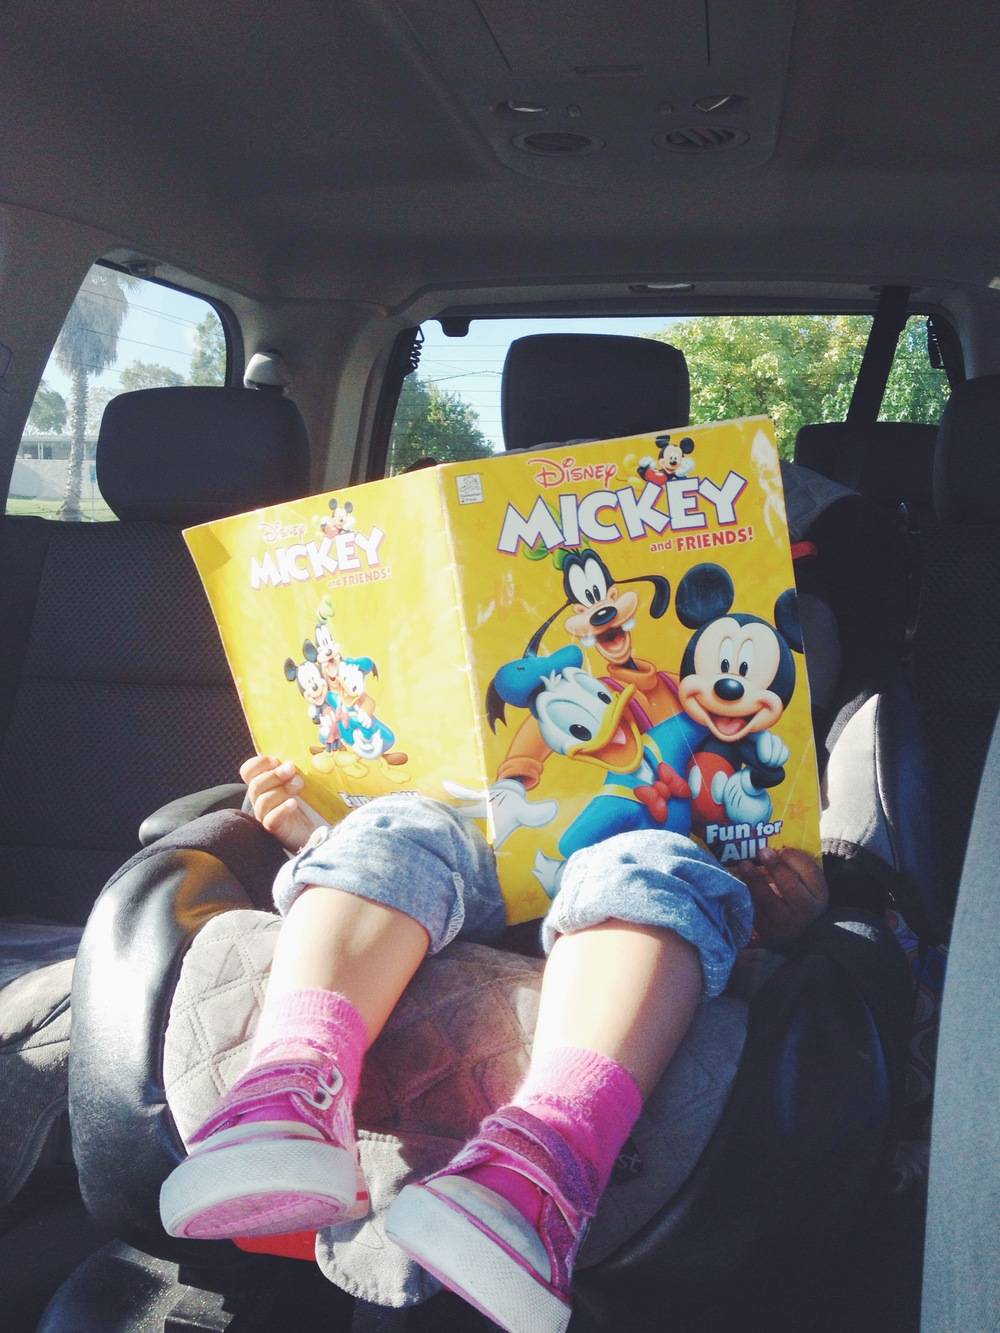 I drive. She reads.